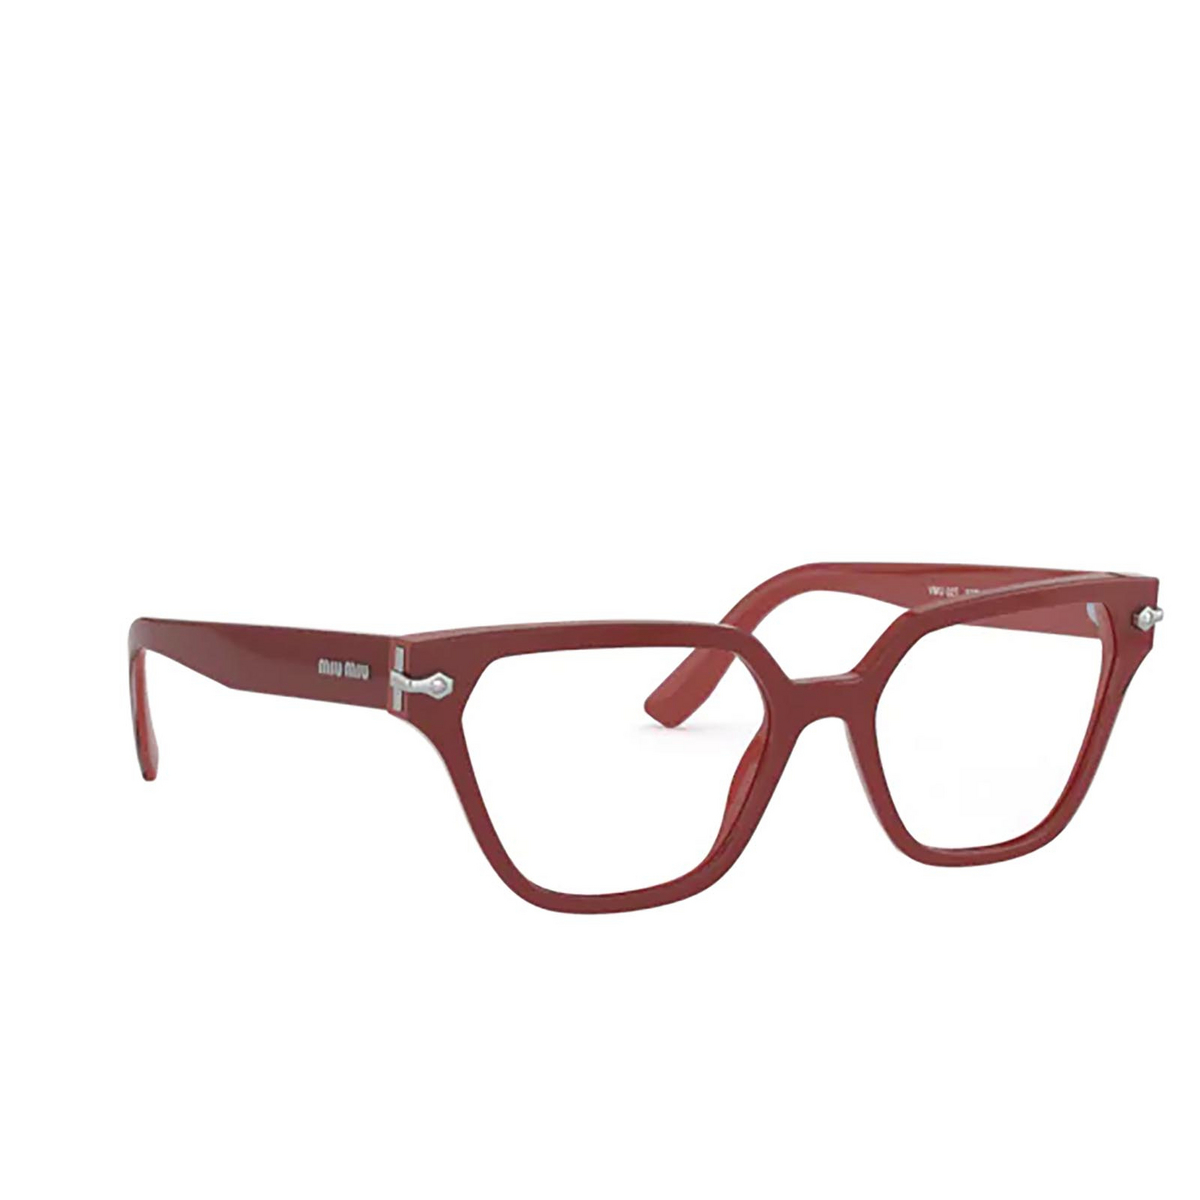 Miu Miu® Irregular Eyeglasses: Special Project MU 02TV color Dark Pink / Crystal 05F1O1 - three-quarters view.